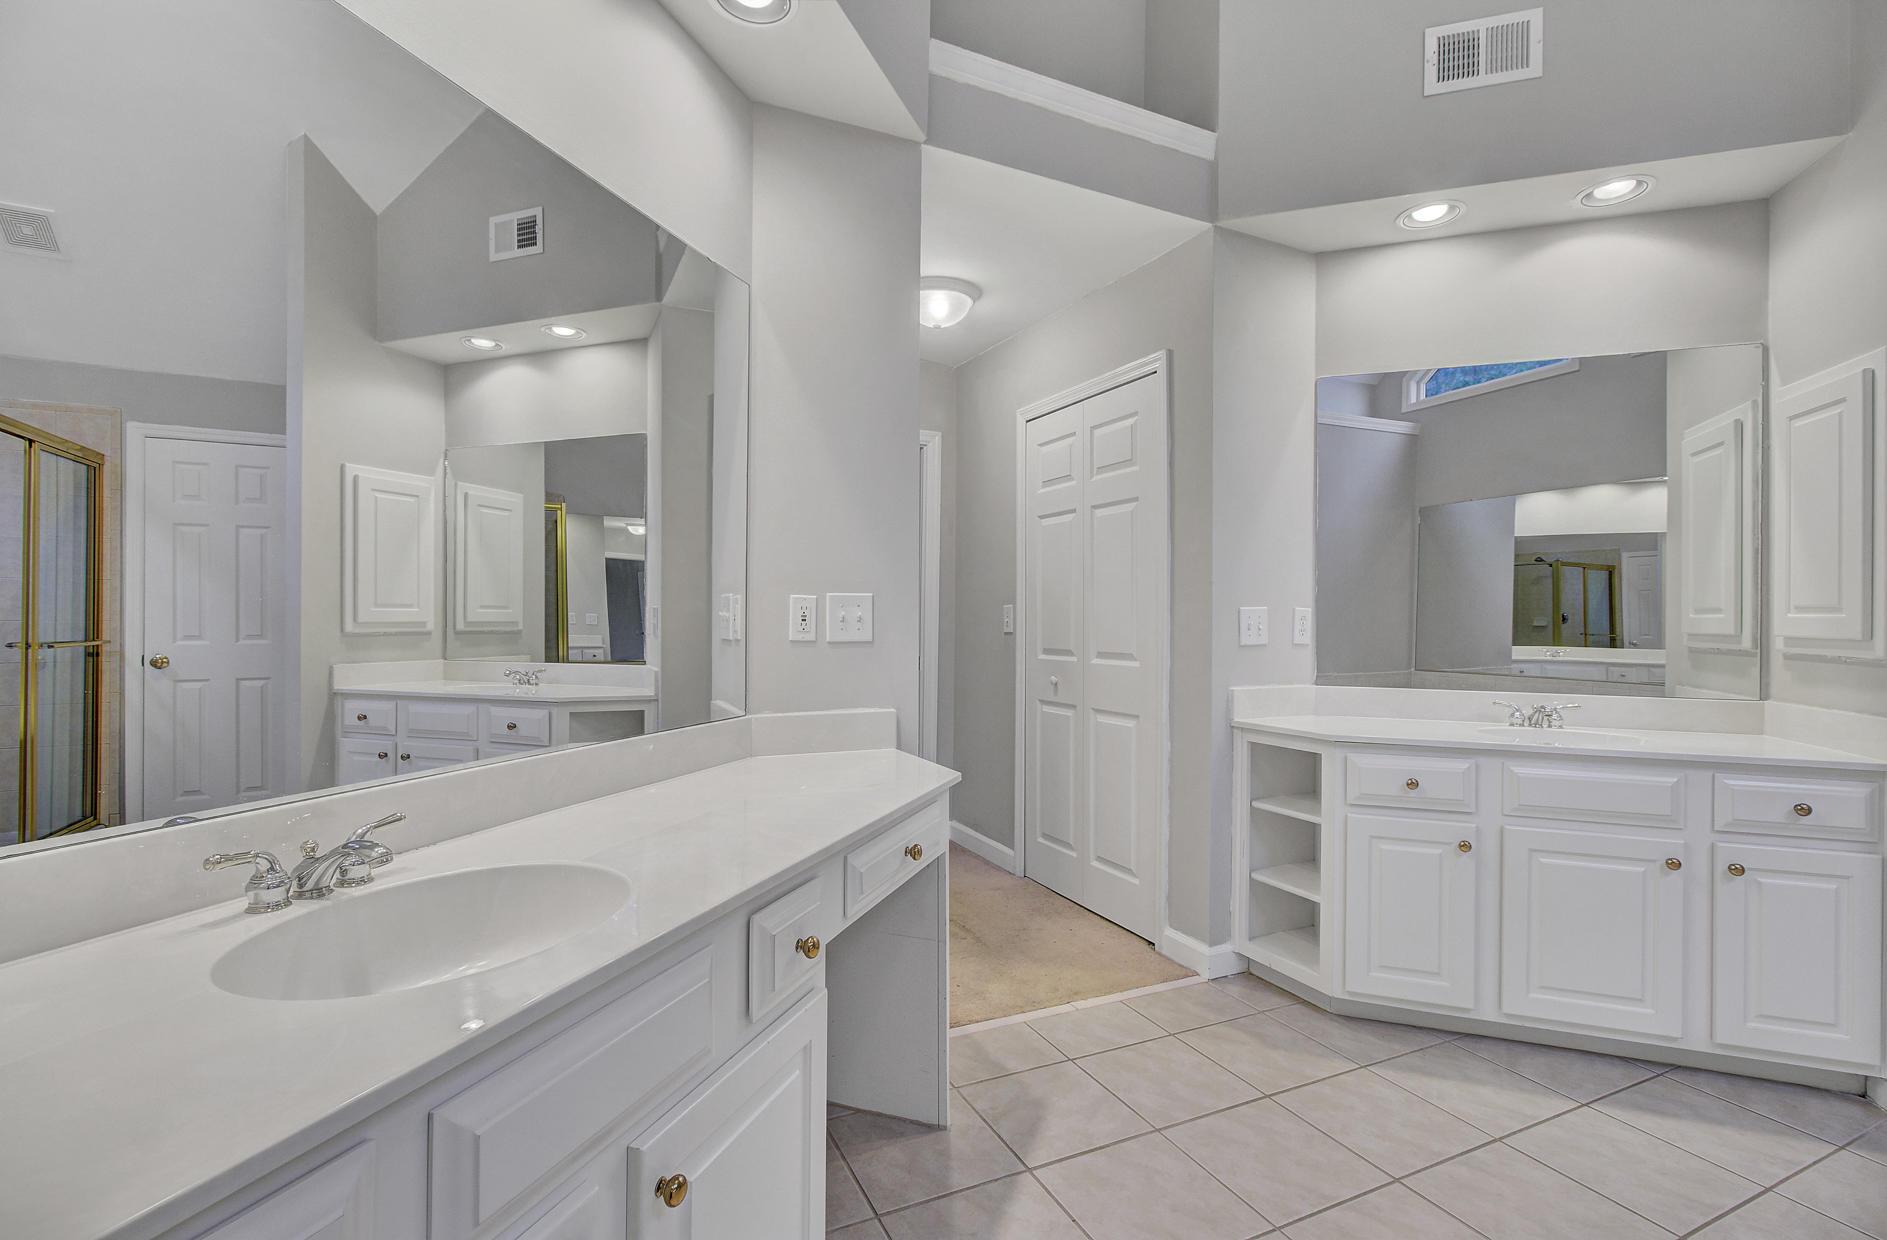 Dunes West Homes For Sale - 2321 Darts Cove, Mount Pleasant, SC - 27